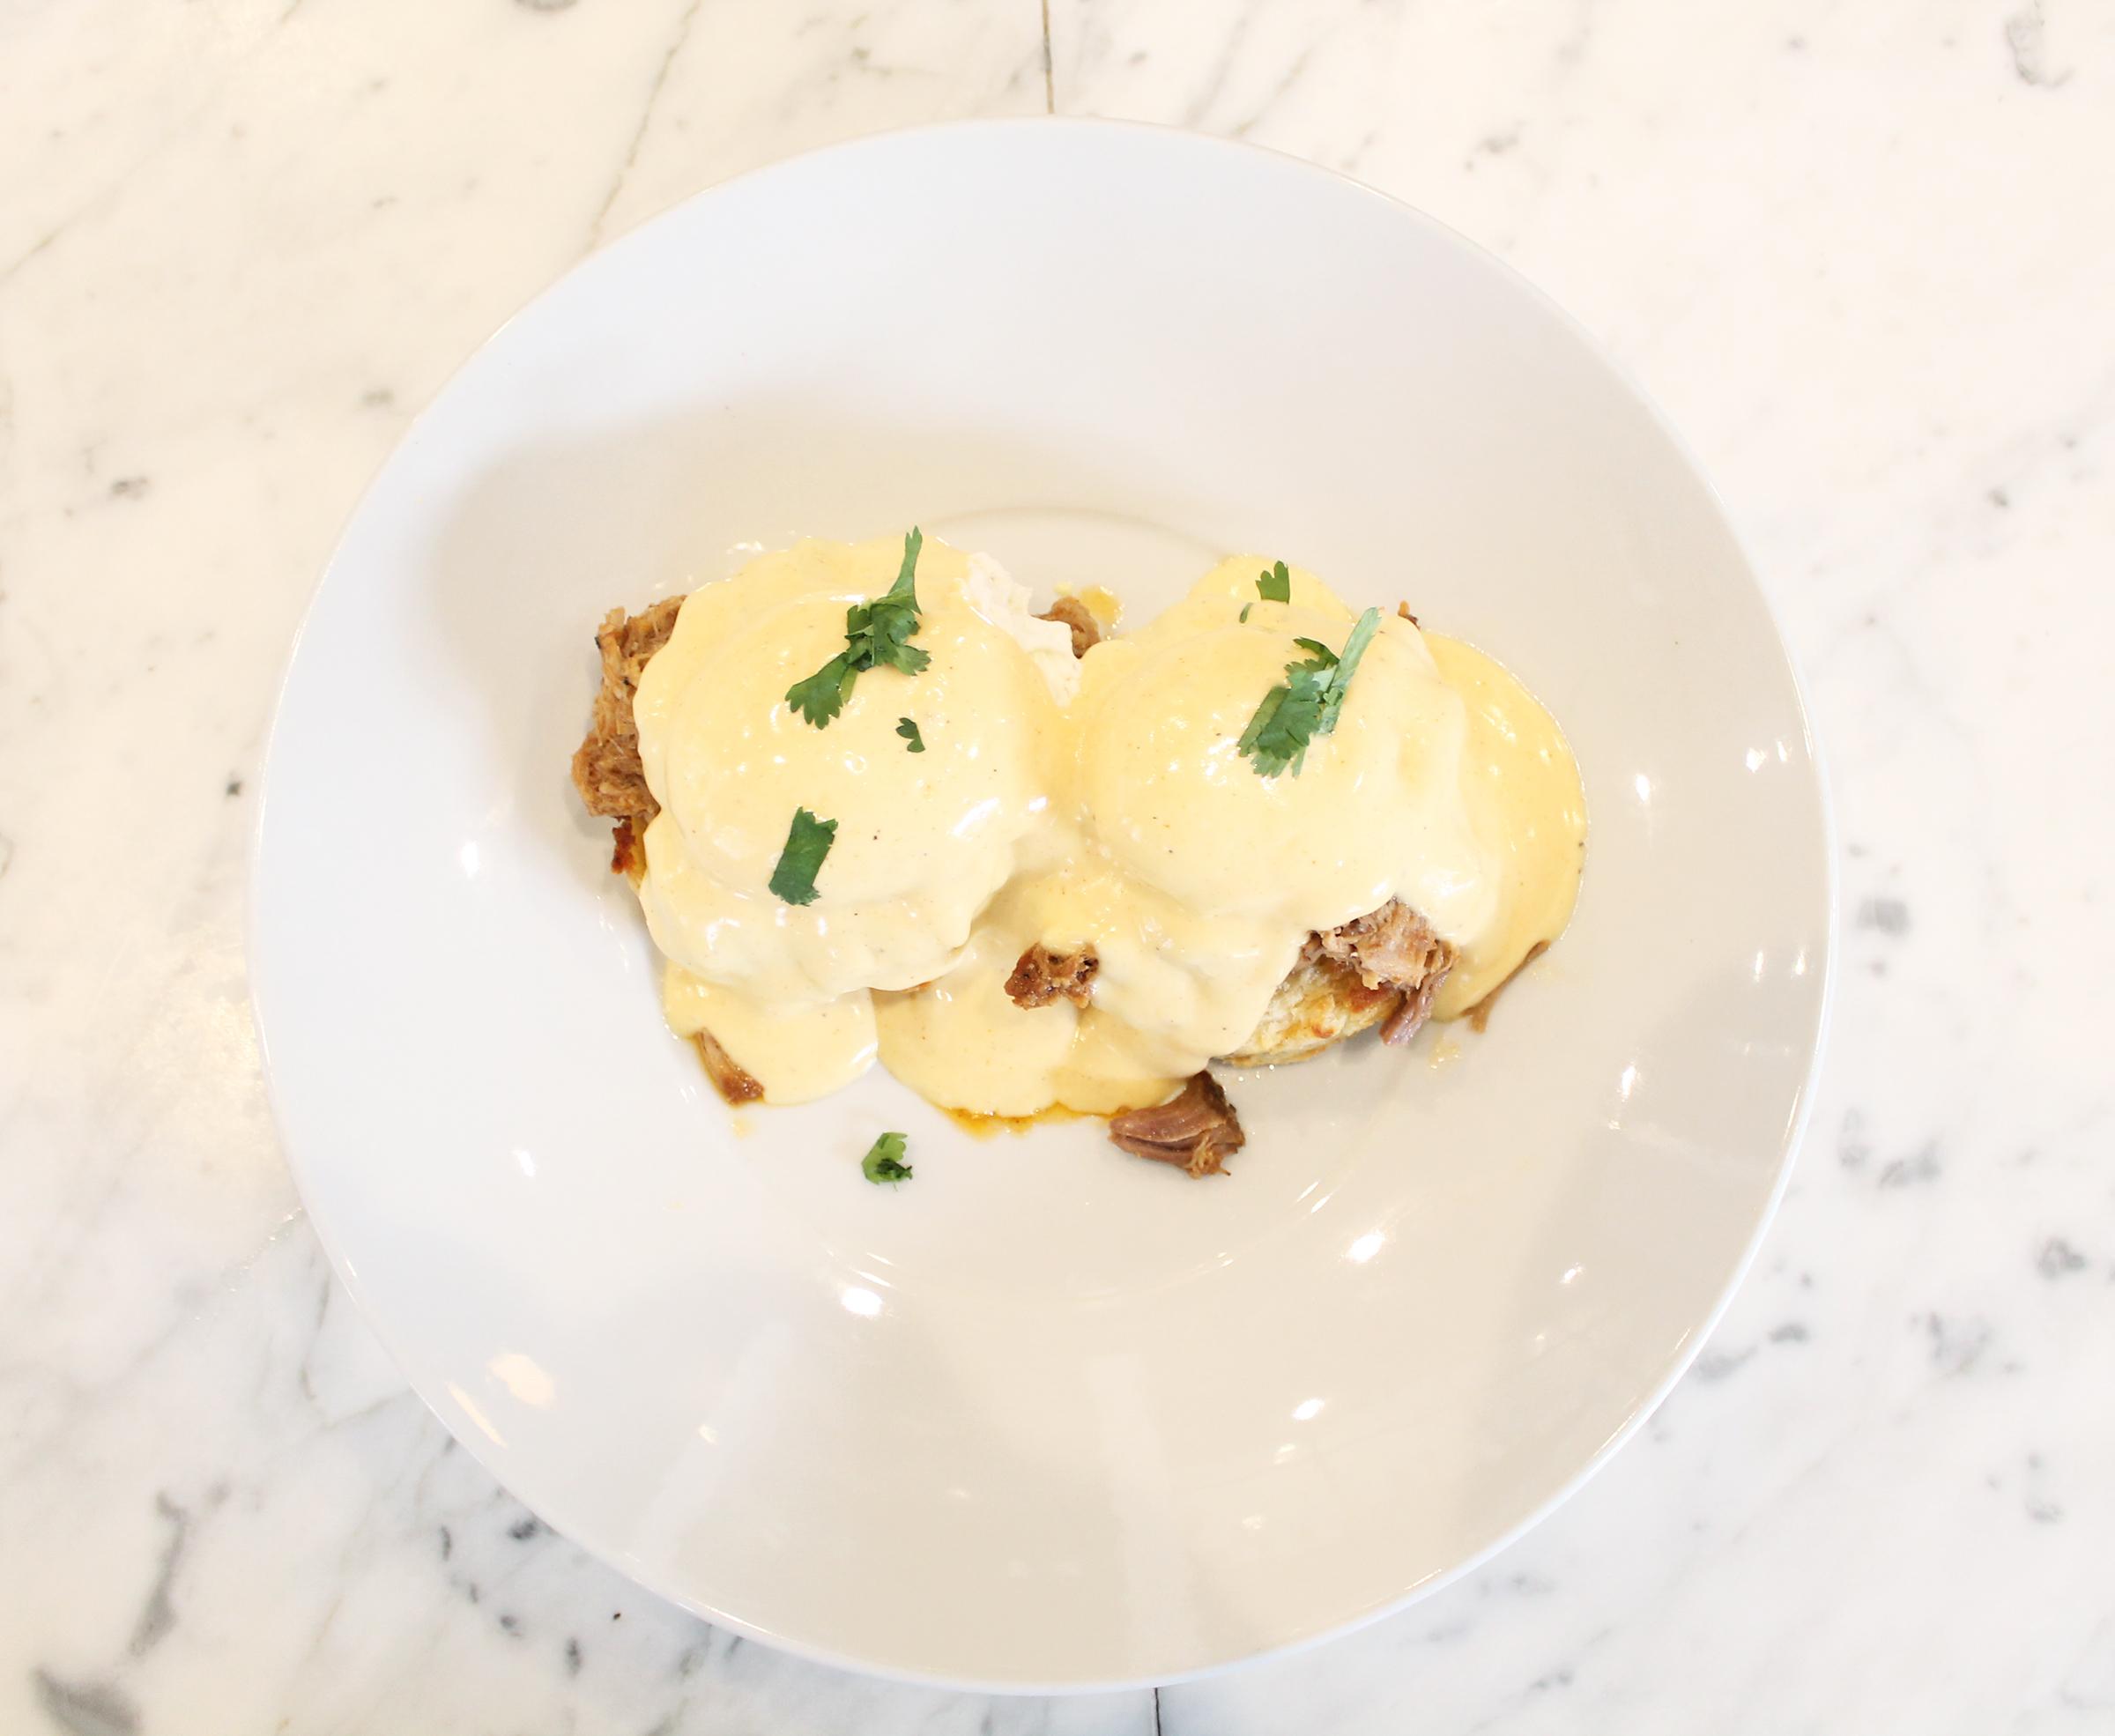 Eggs Benedict: Buttermilk Biscuits, Pulled Pork, Hollandaise